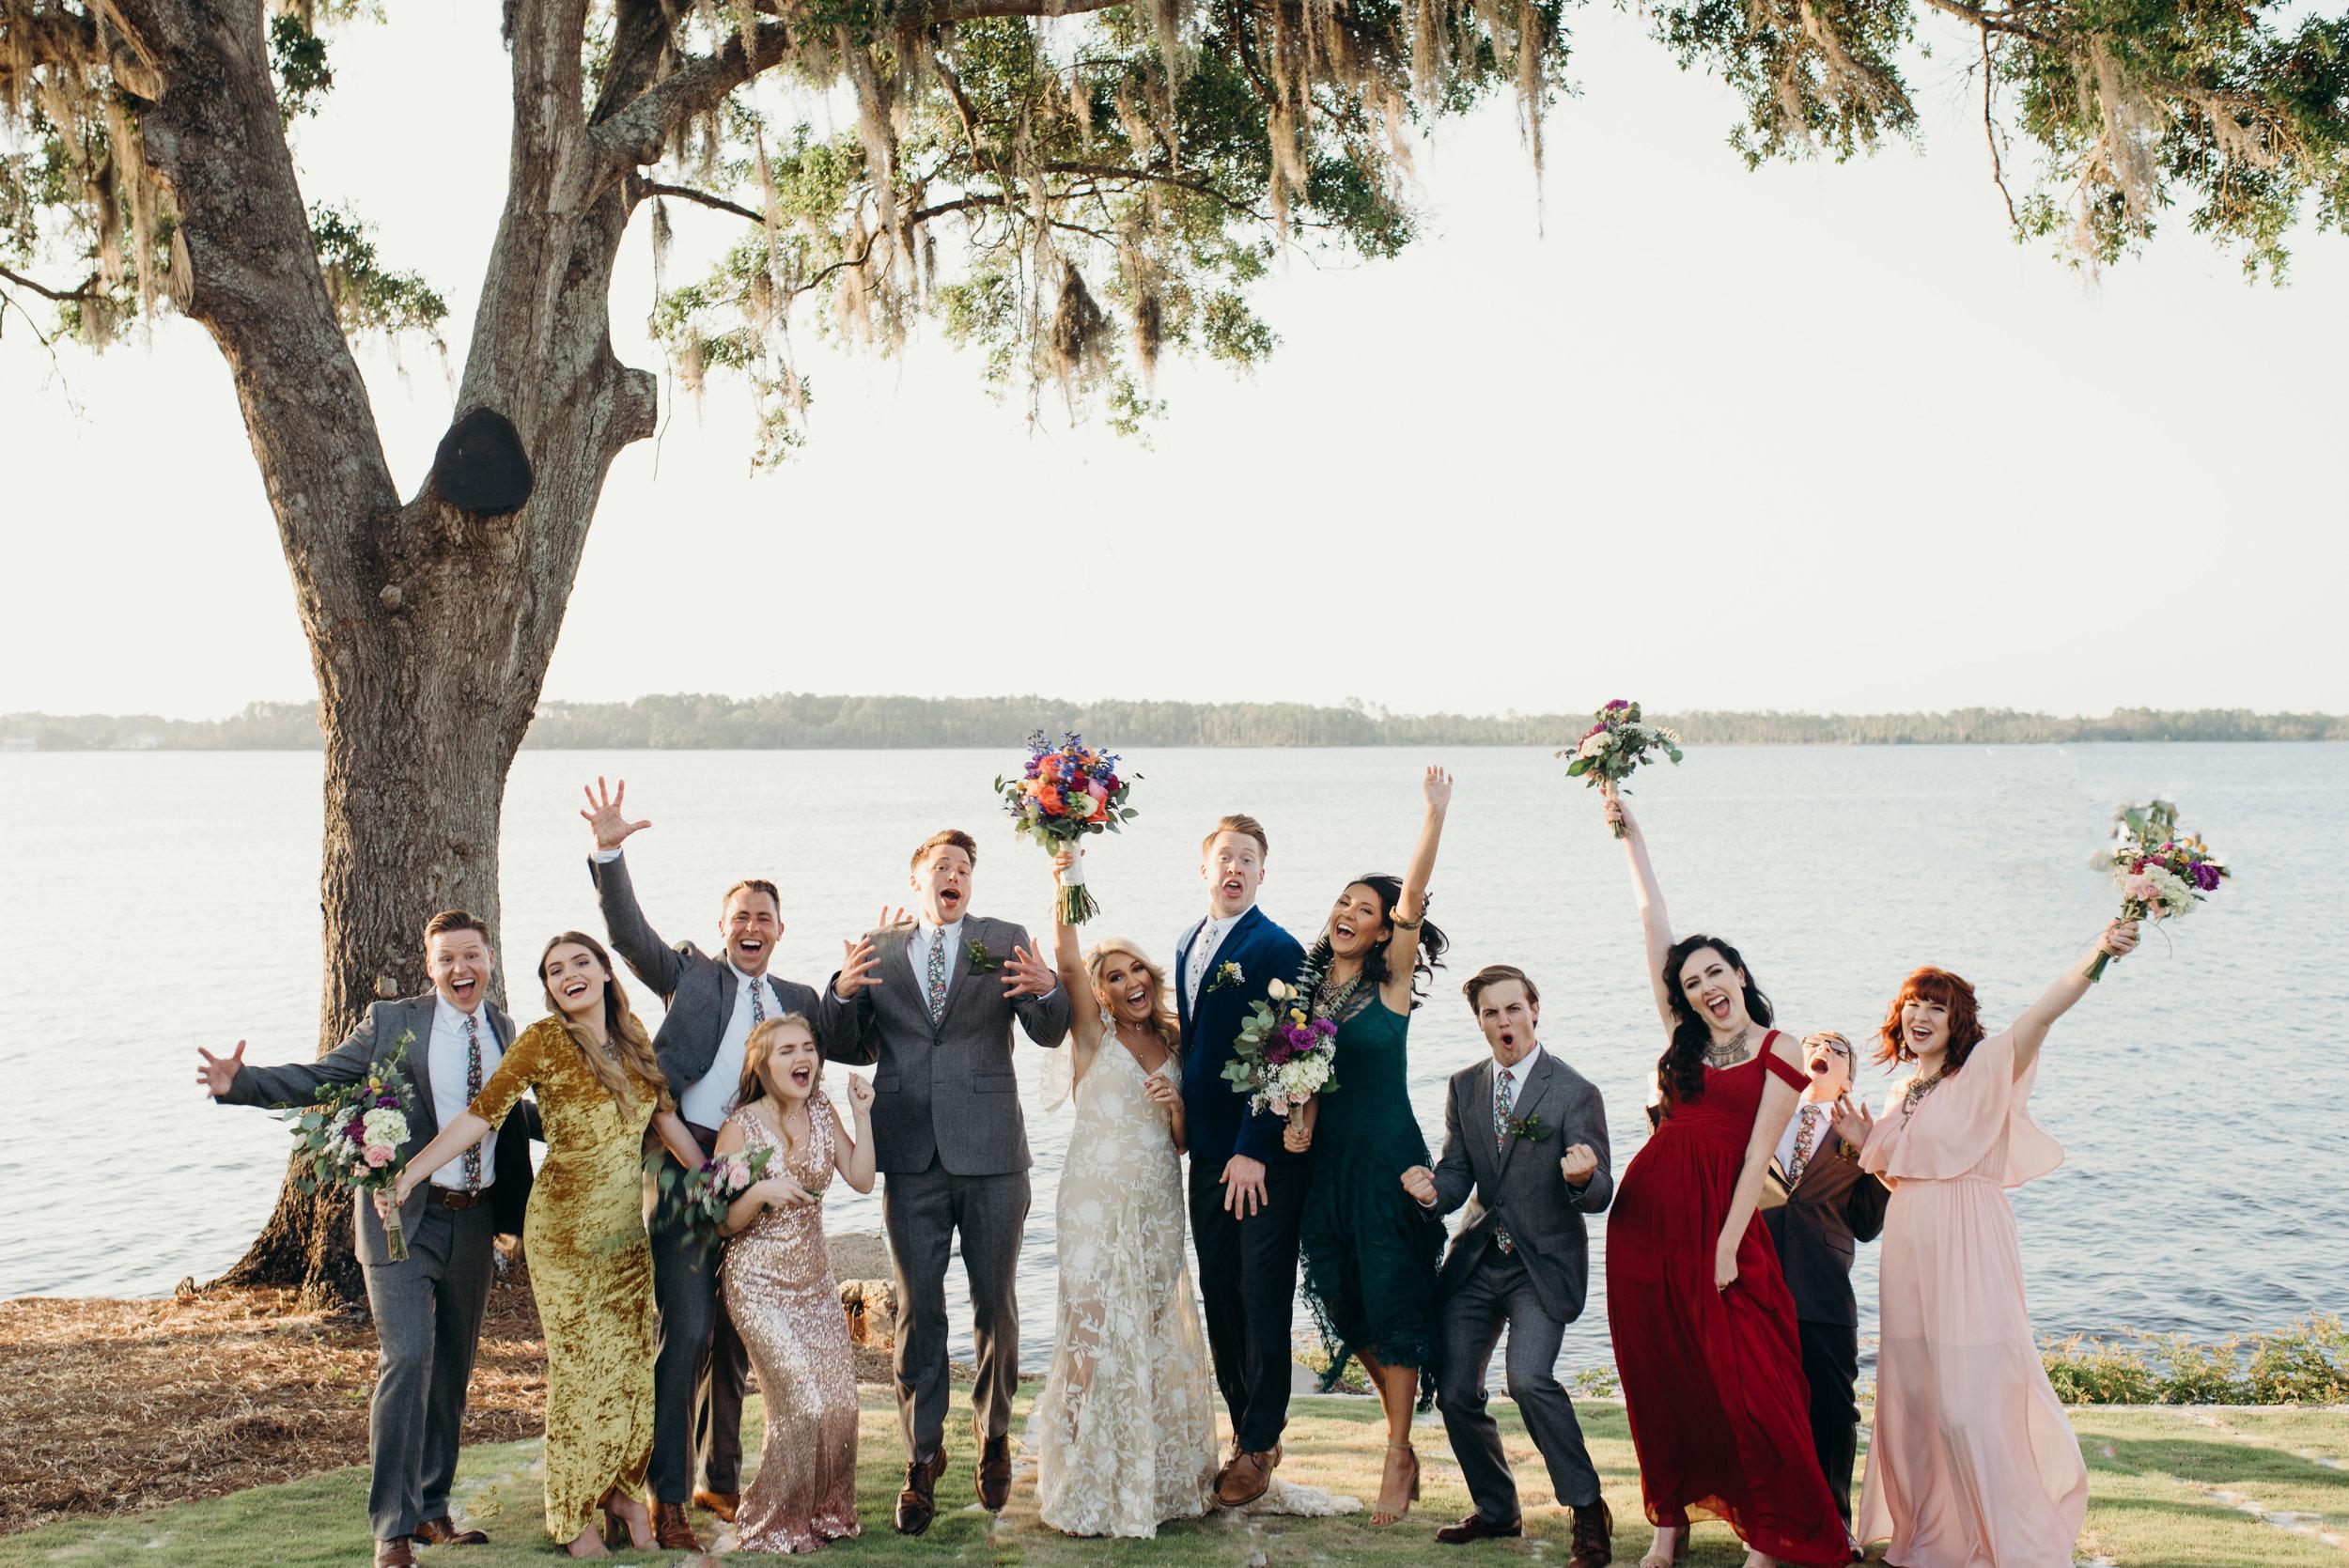 zayda-collin-panama-city-wedding-photography-trippy-bohemian-lisa-frank-wedding-group-shots-24.jpg